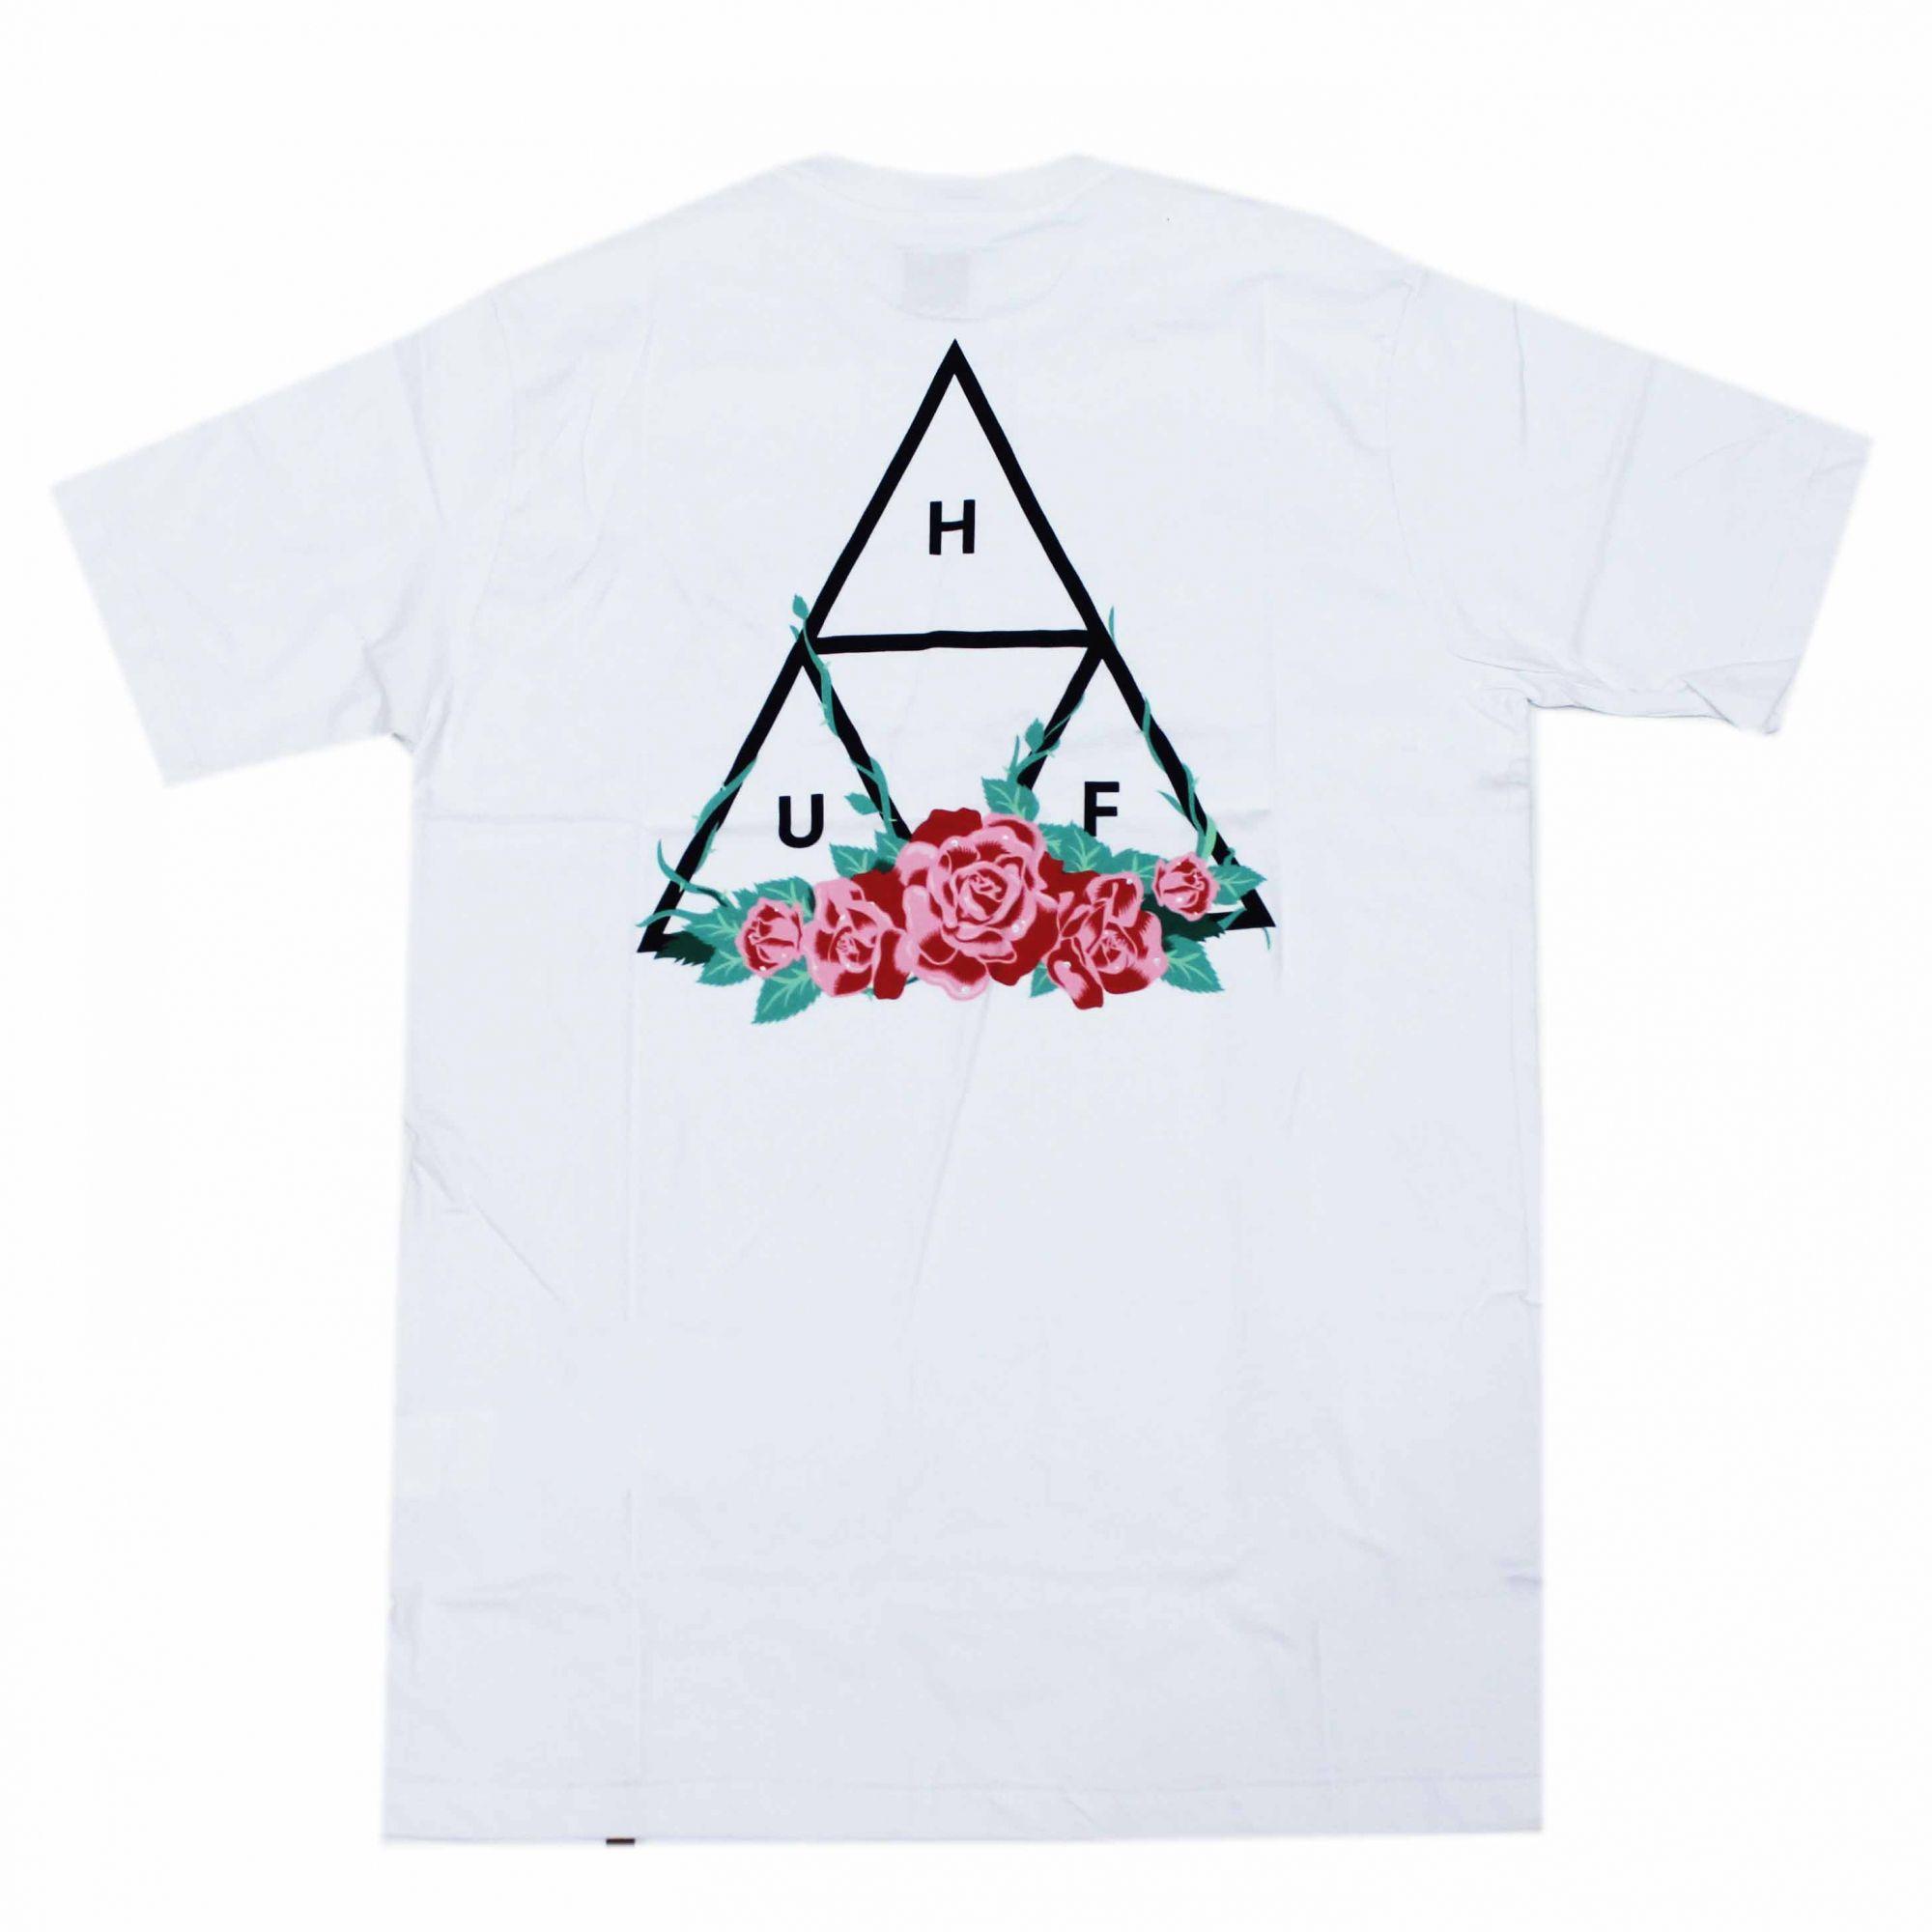 Camiseta HUF City Rose - Branco